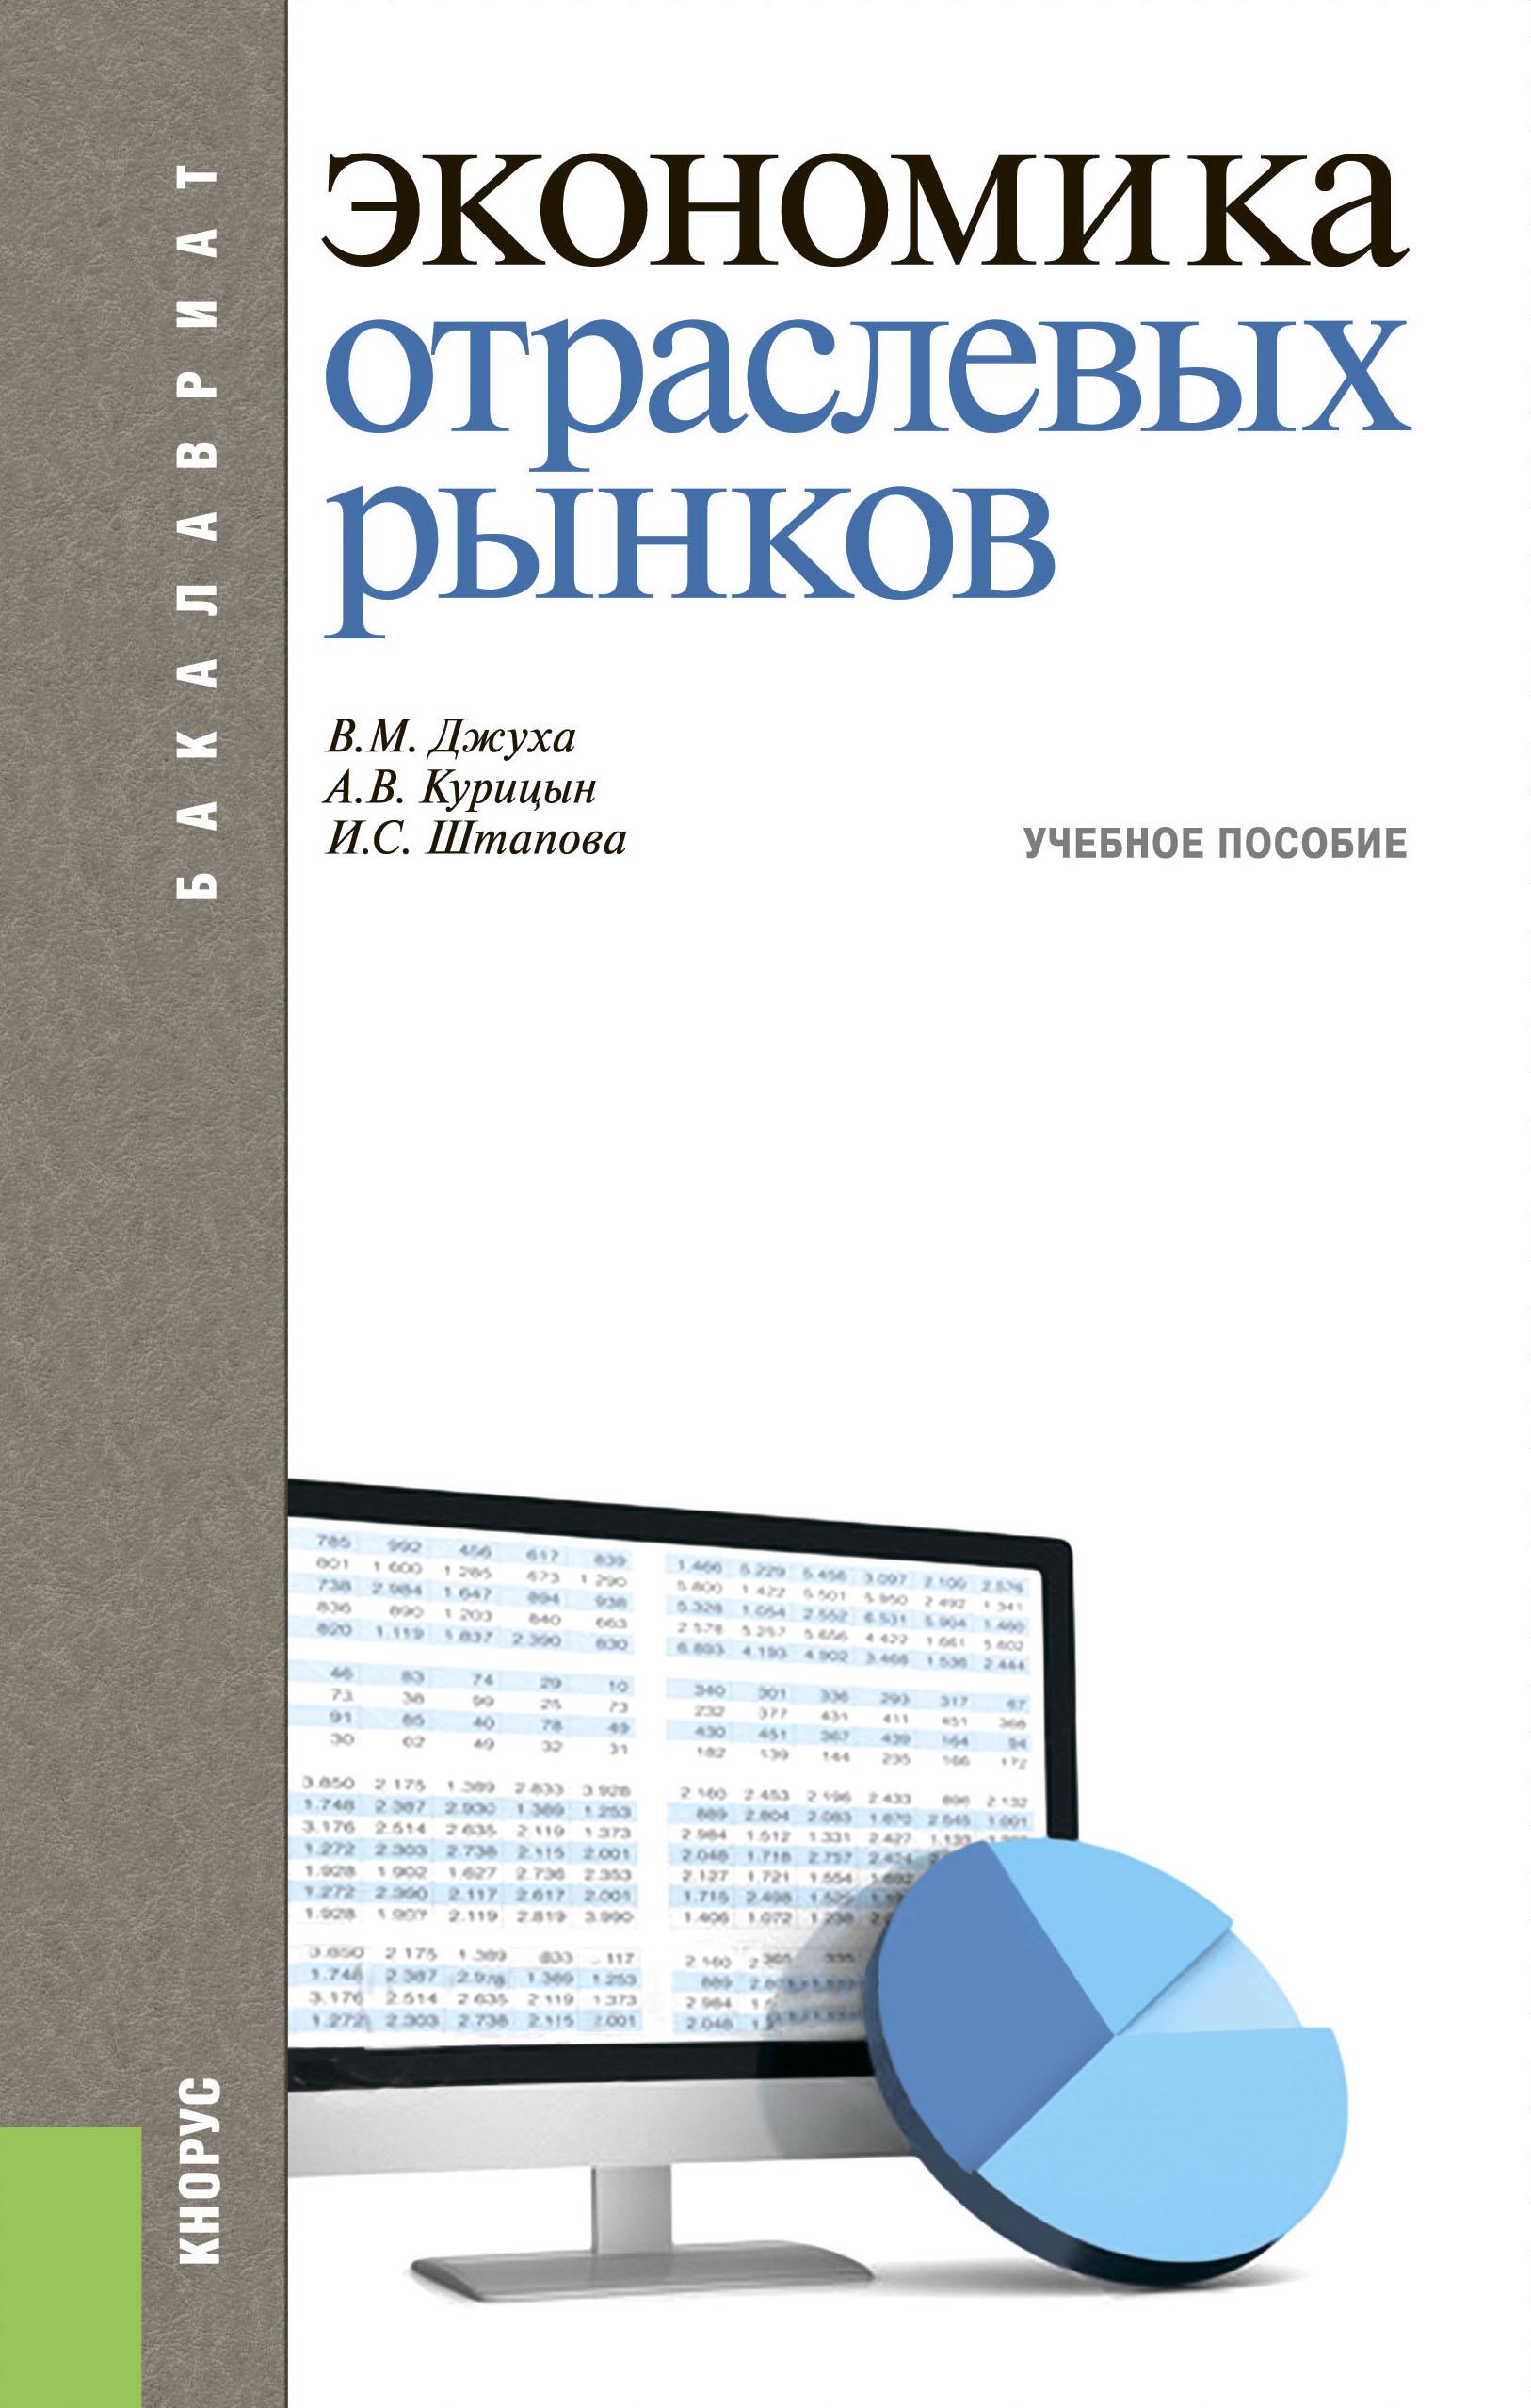 Анатолий Васильевич Курицын Экономика отраслевых рынков в м джуха а в курицын и с штапова экономика отраслевых рынков